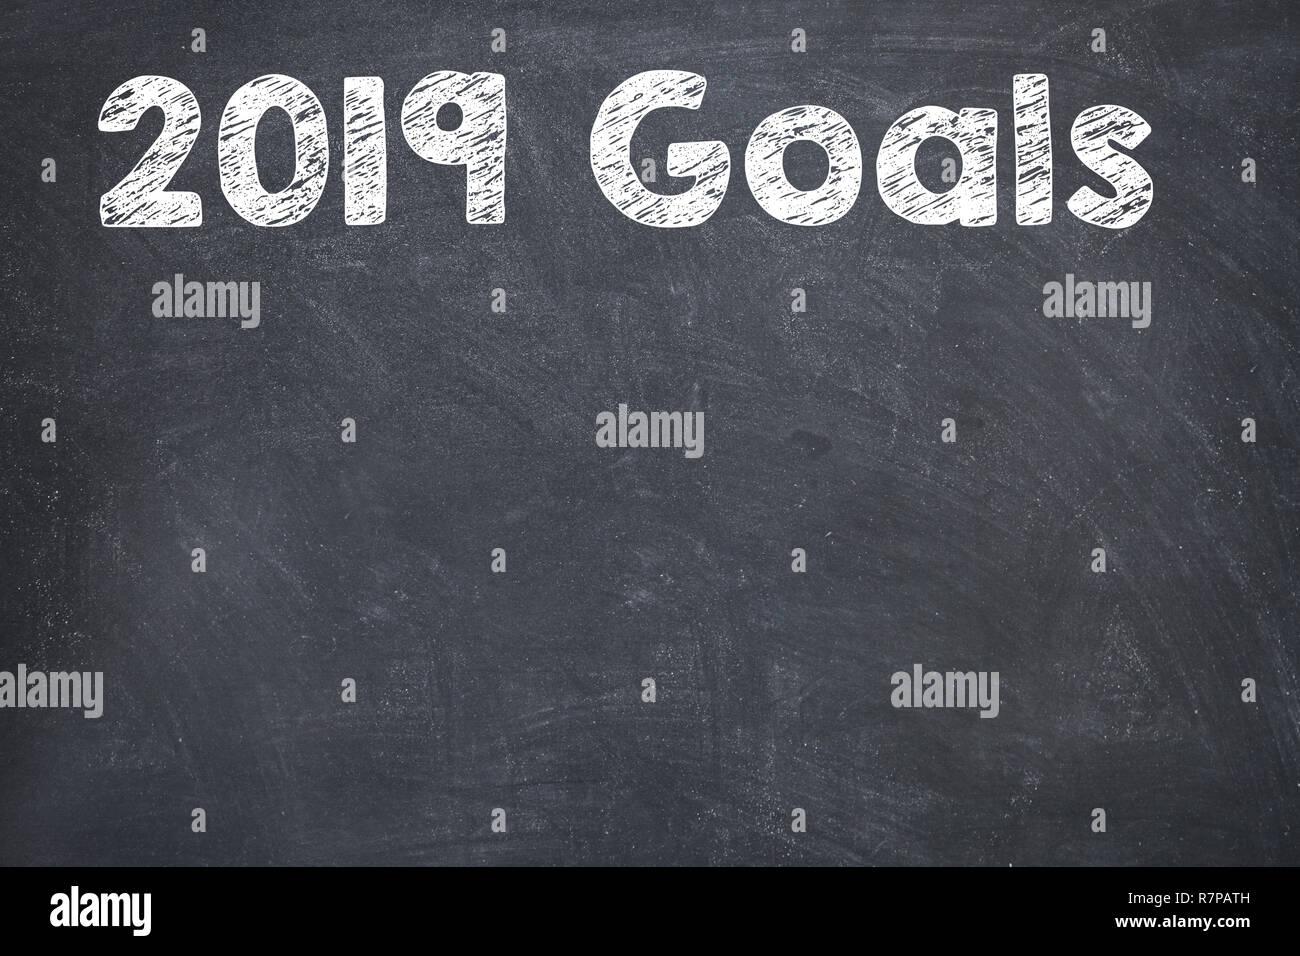 Goals 2019 on Blackboard - Stock Image